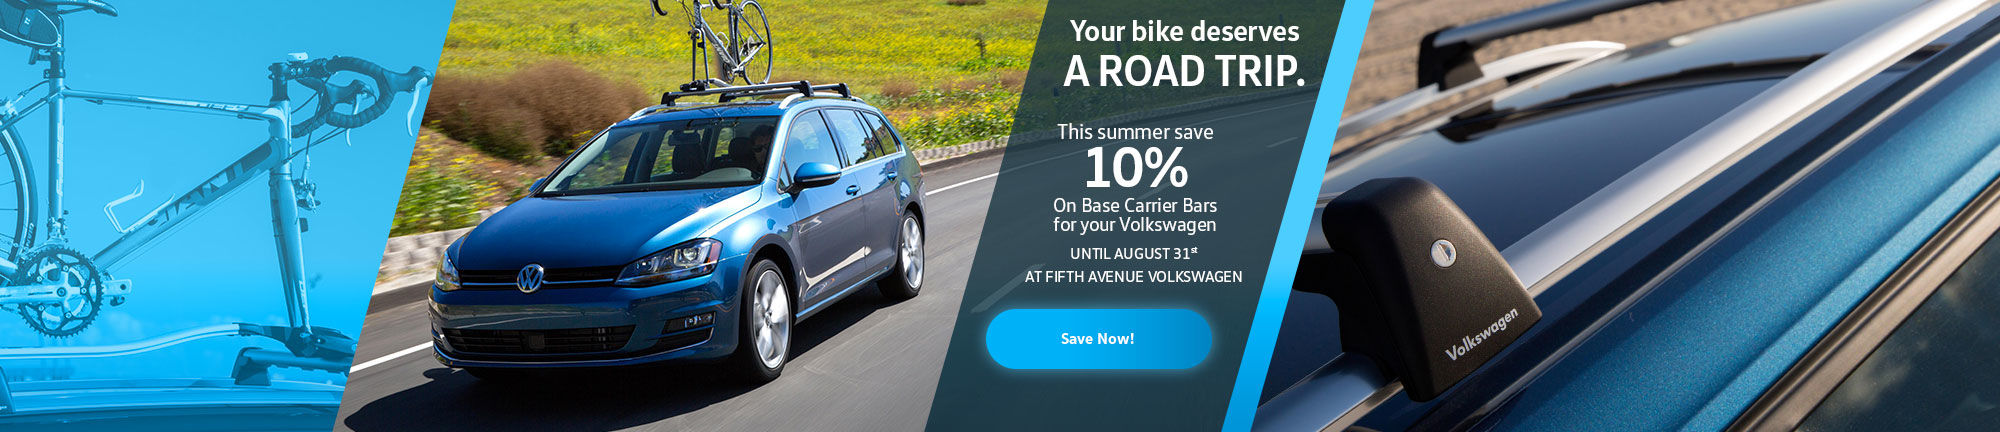 Save 10% on Base Carrier Bars